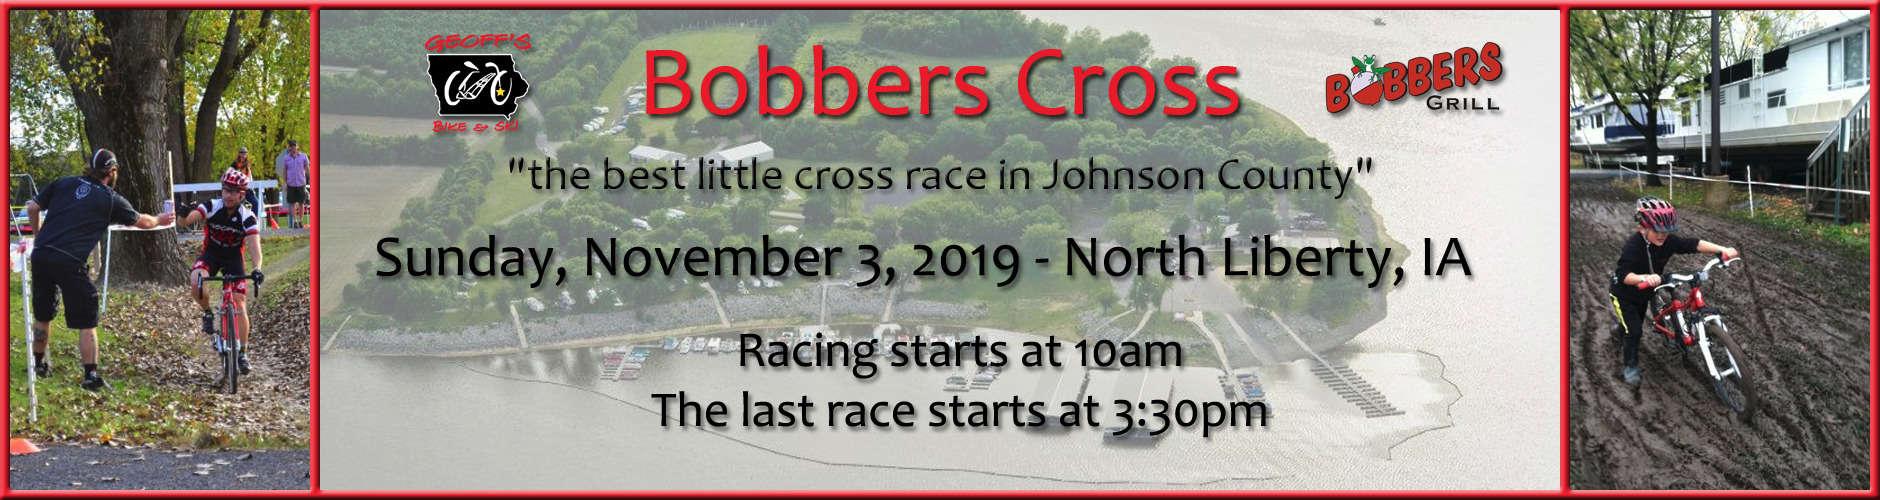 Bobbers Cross 2019